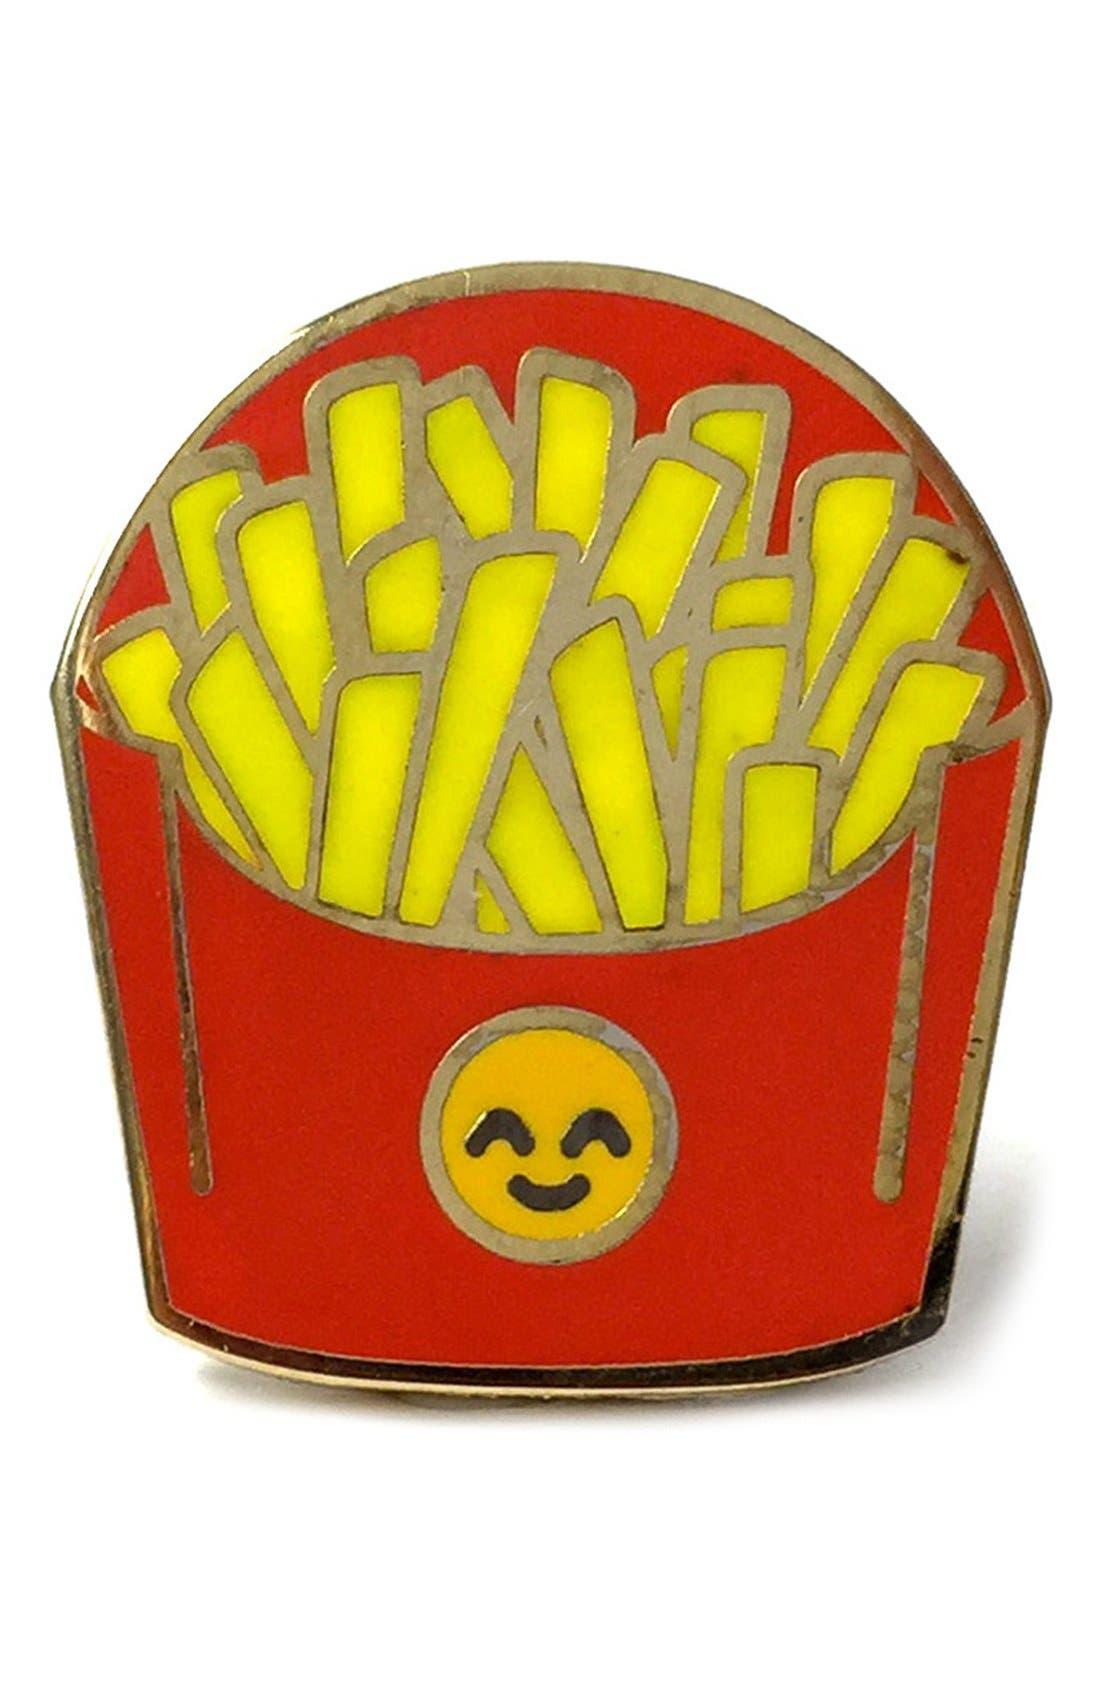 Main Image - PINTRILL 'Fries' Fashion Accessory Pin